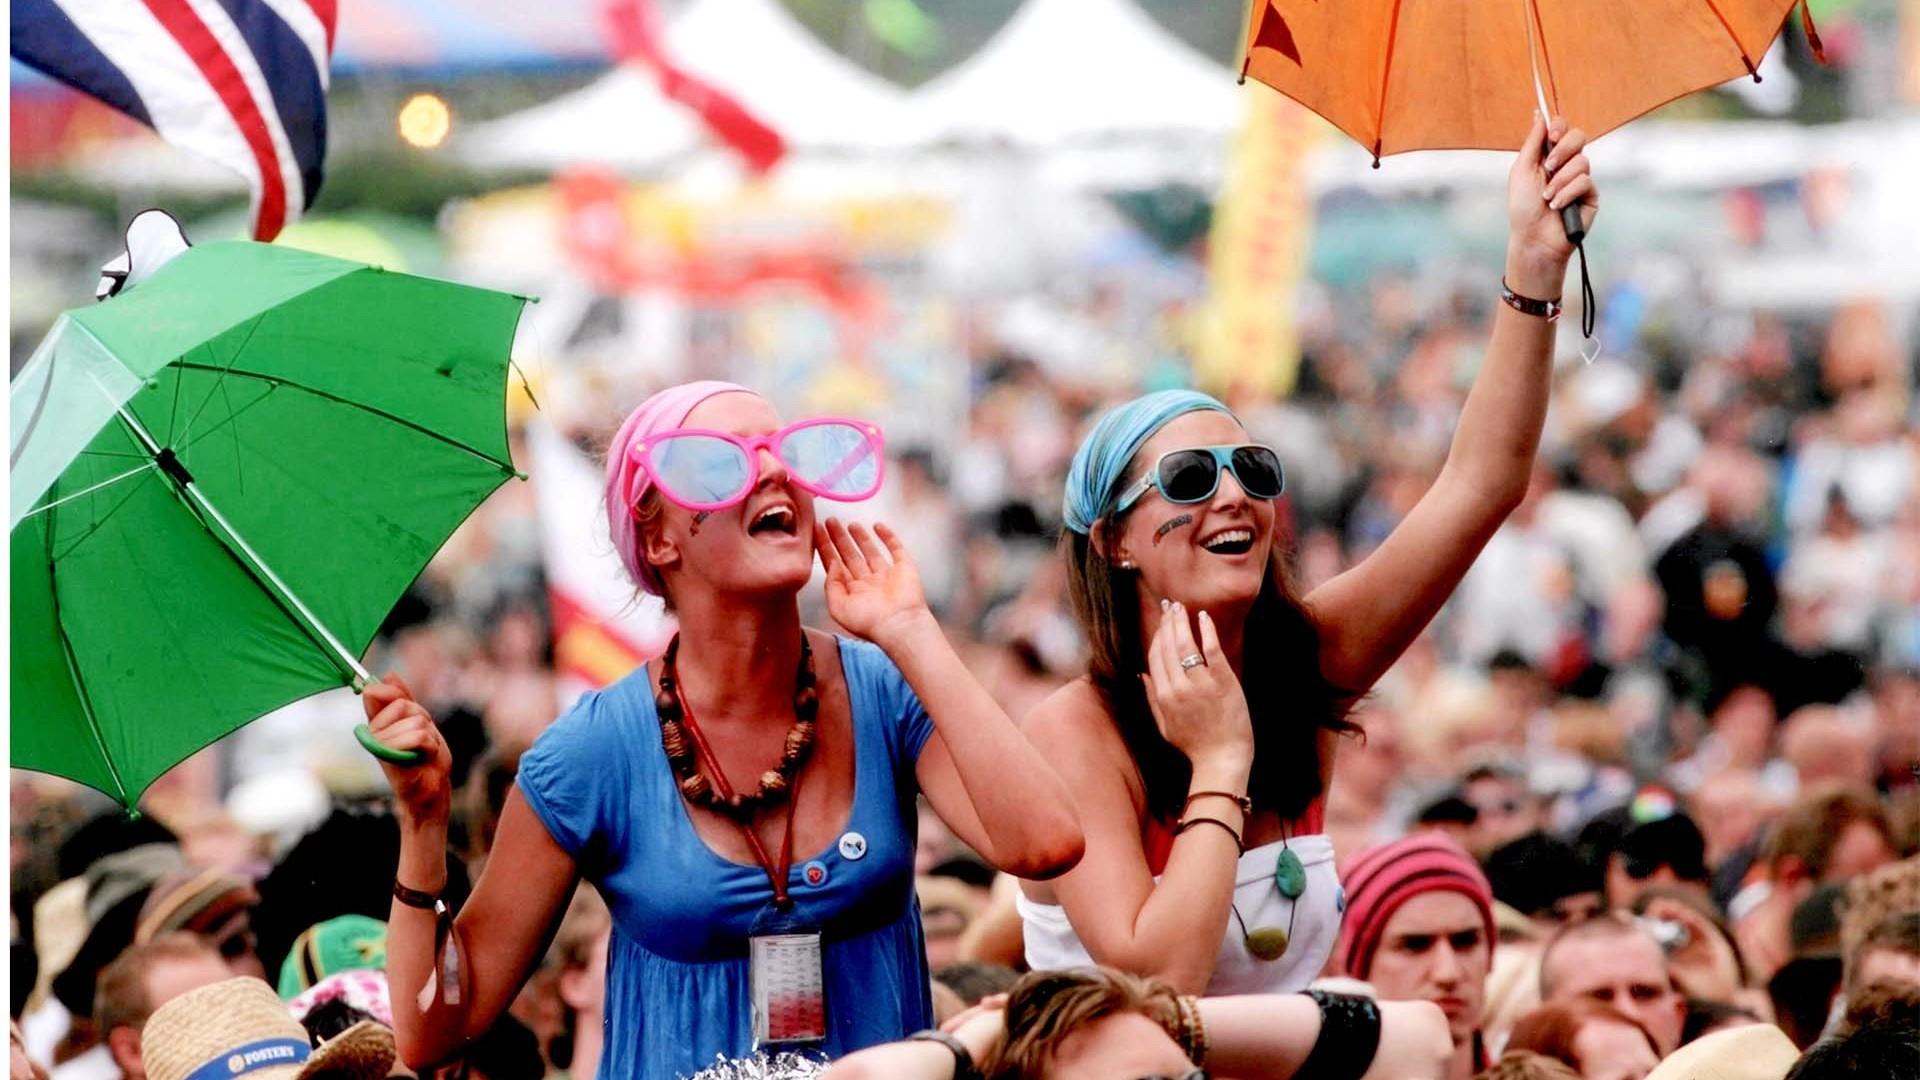 Rock Festivals: Description, History